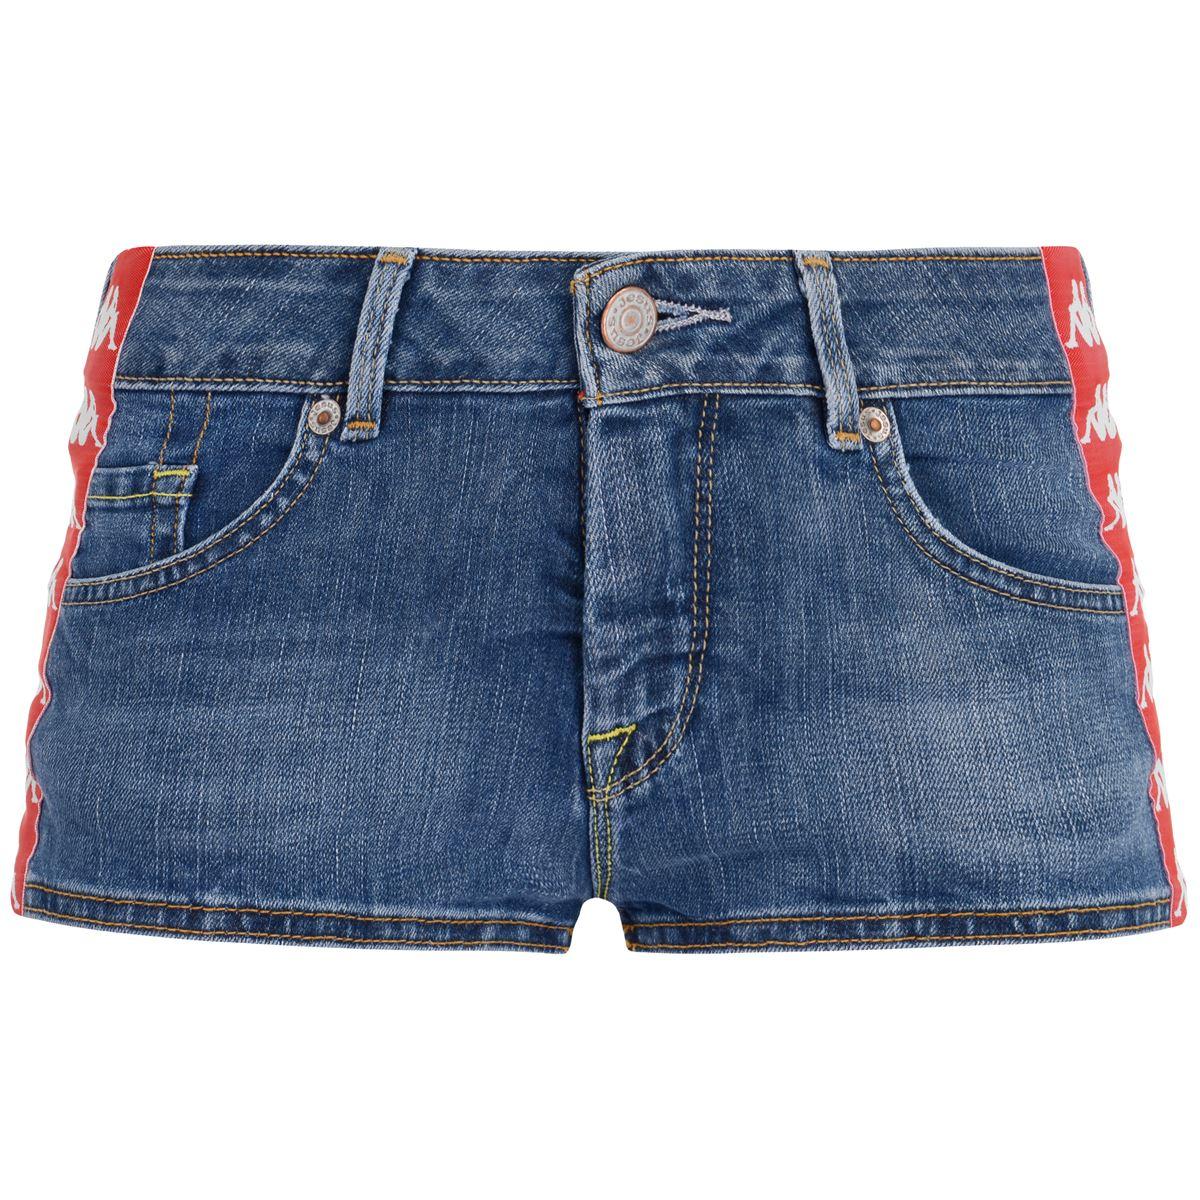 Pantaloncini Jesus Jeans donna-461196WKPA